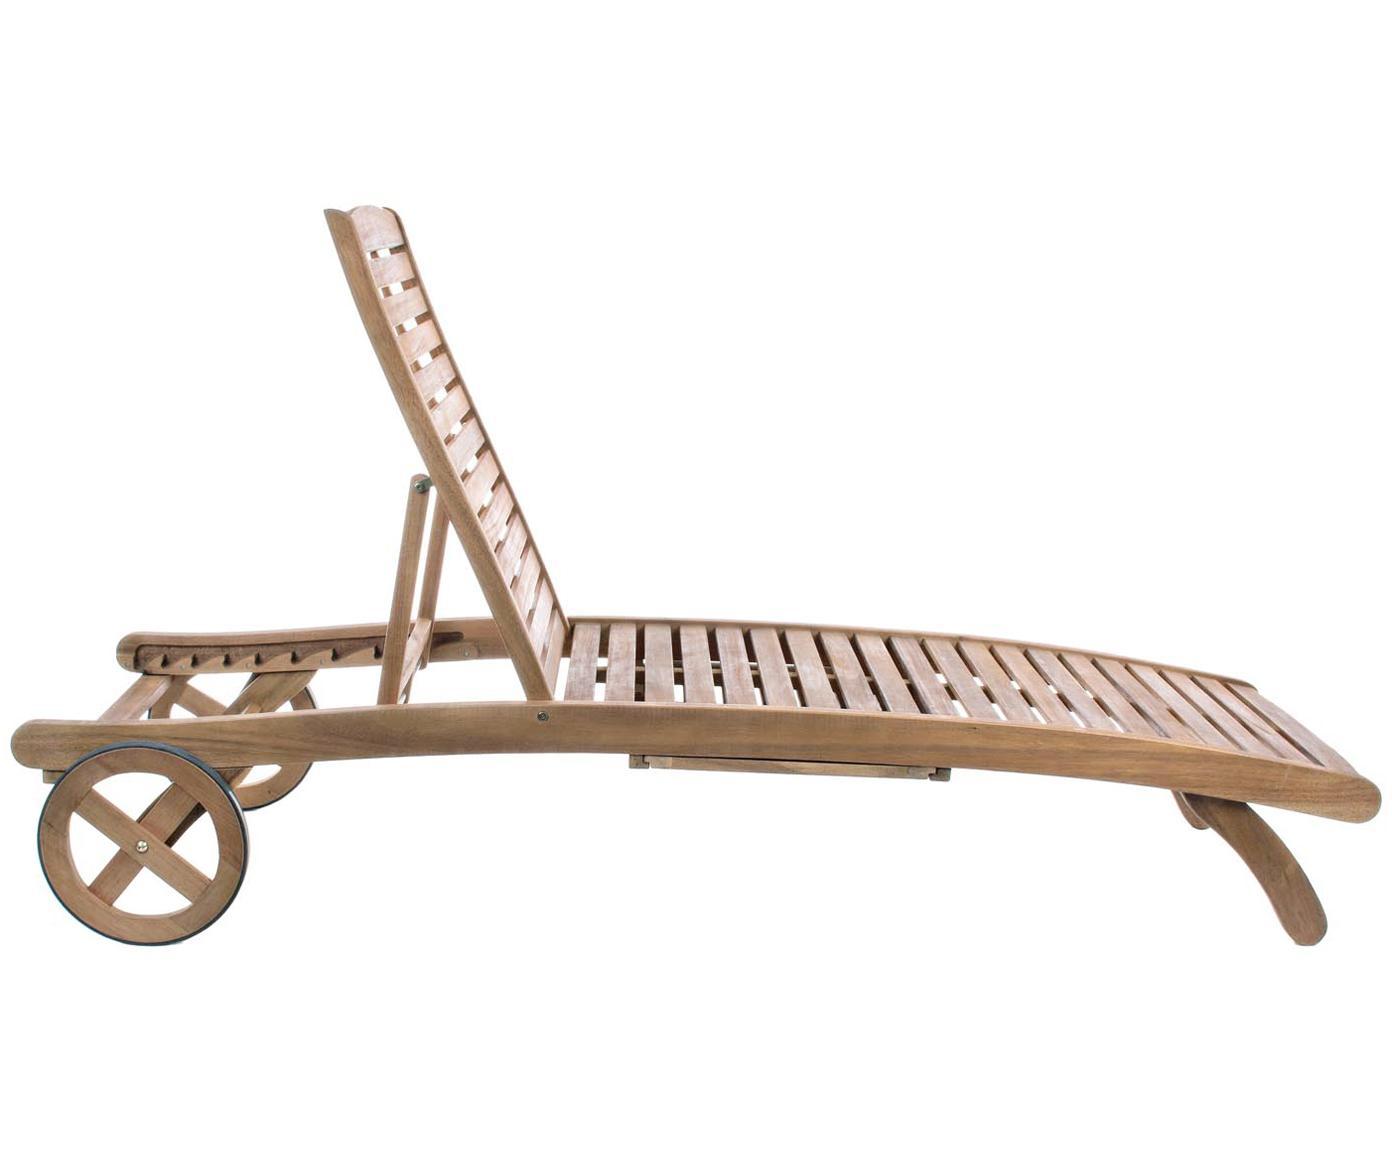 Gartenliege Noemi, Massives Akazienholz, geölt, Akazie, 58 x 195 cm